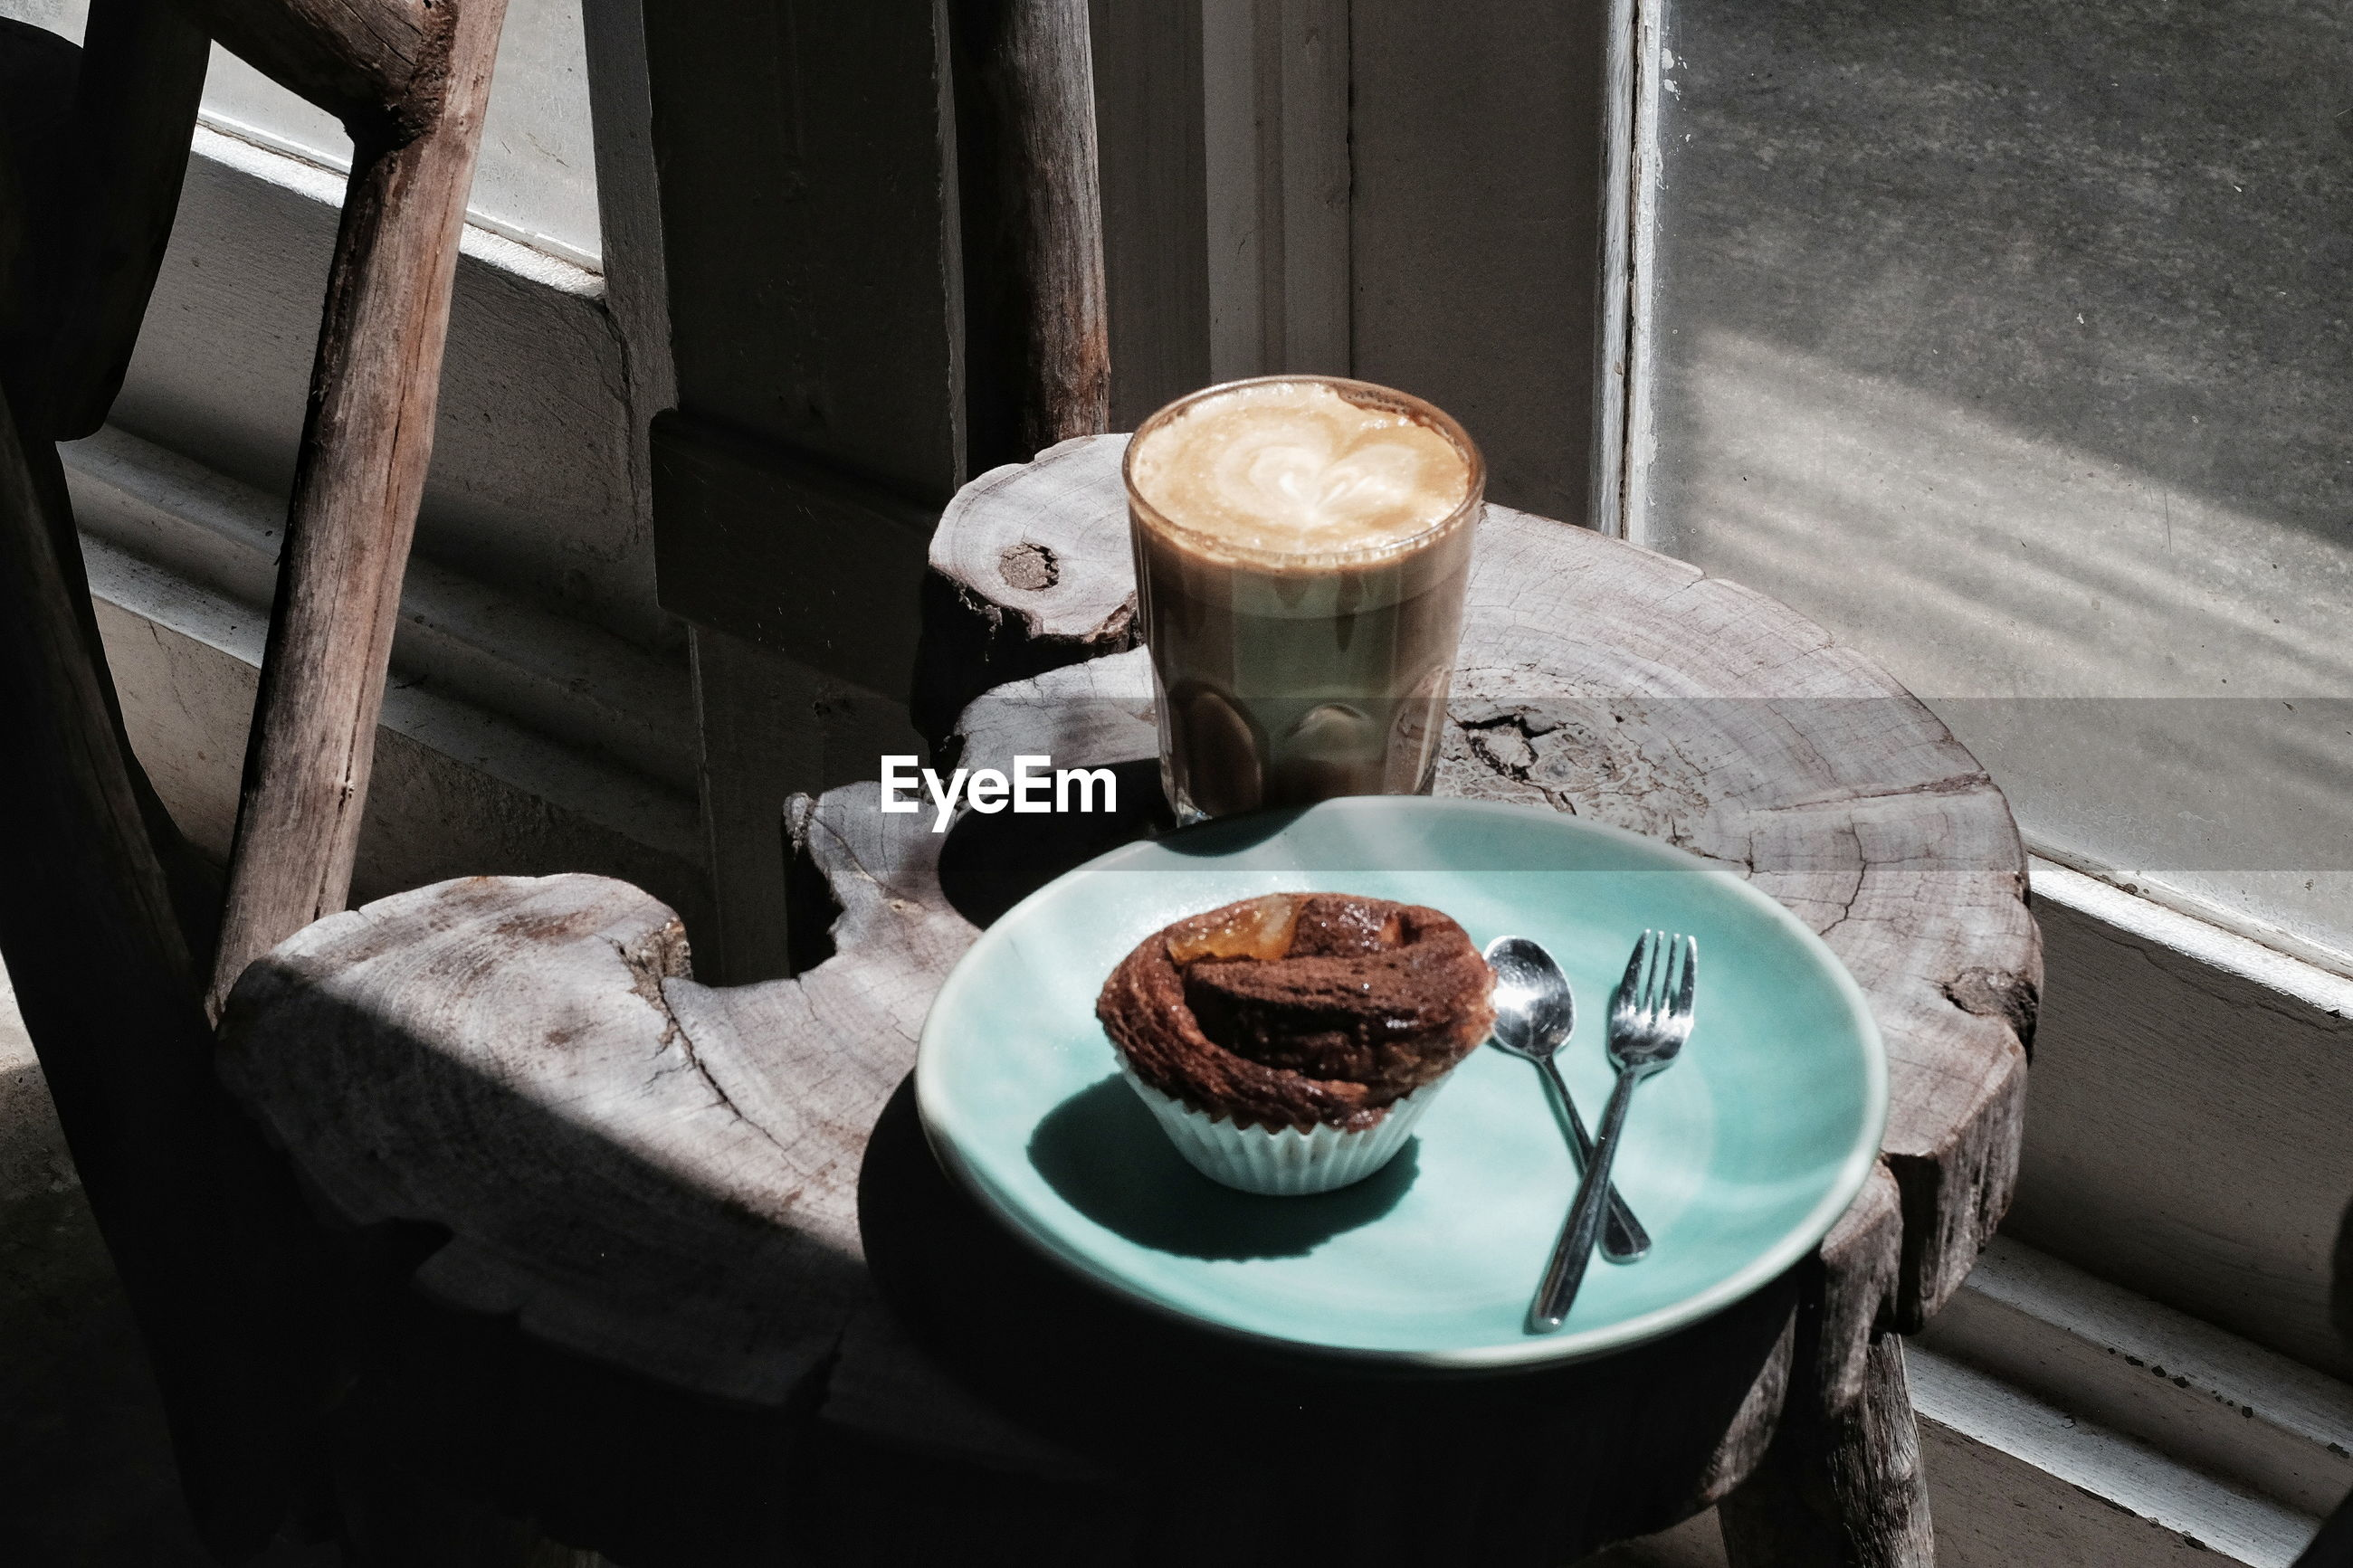 High angle view of dessert and coffee on tree stump